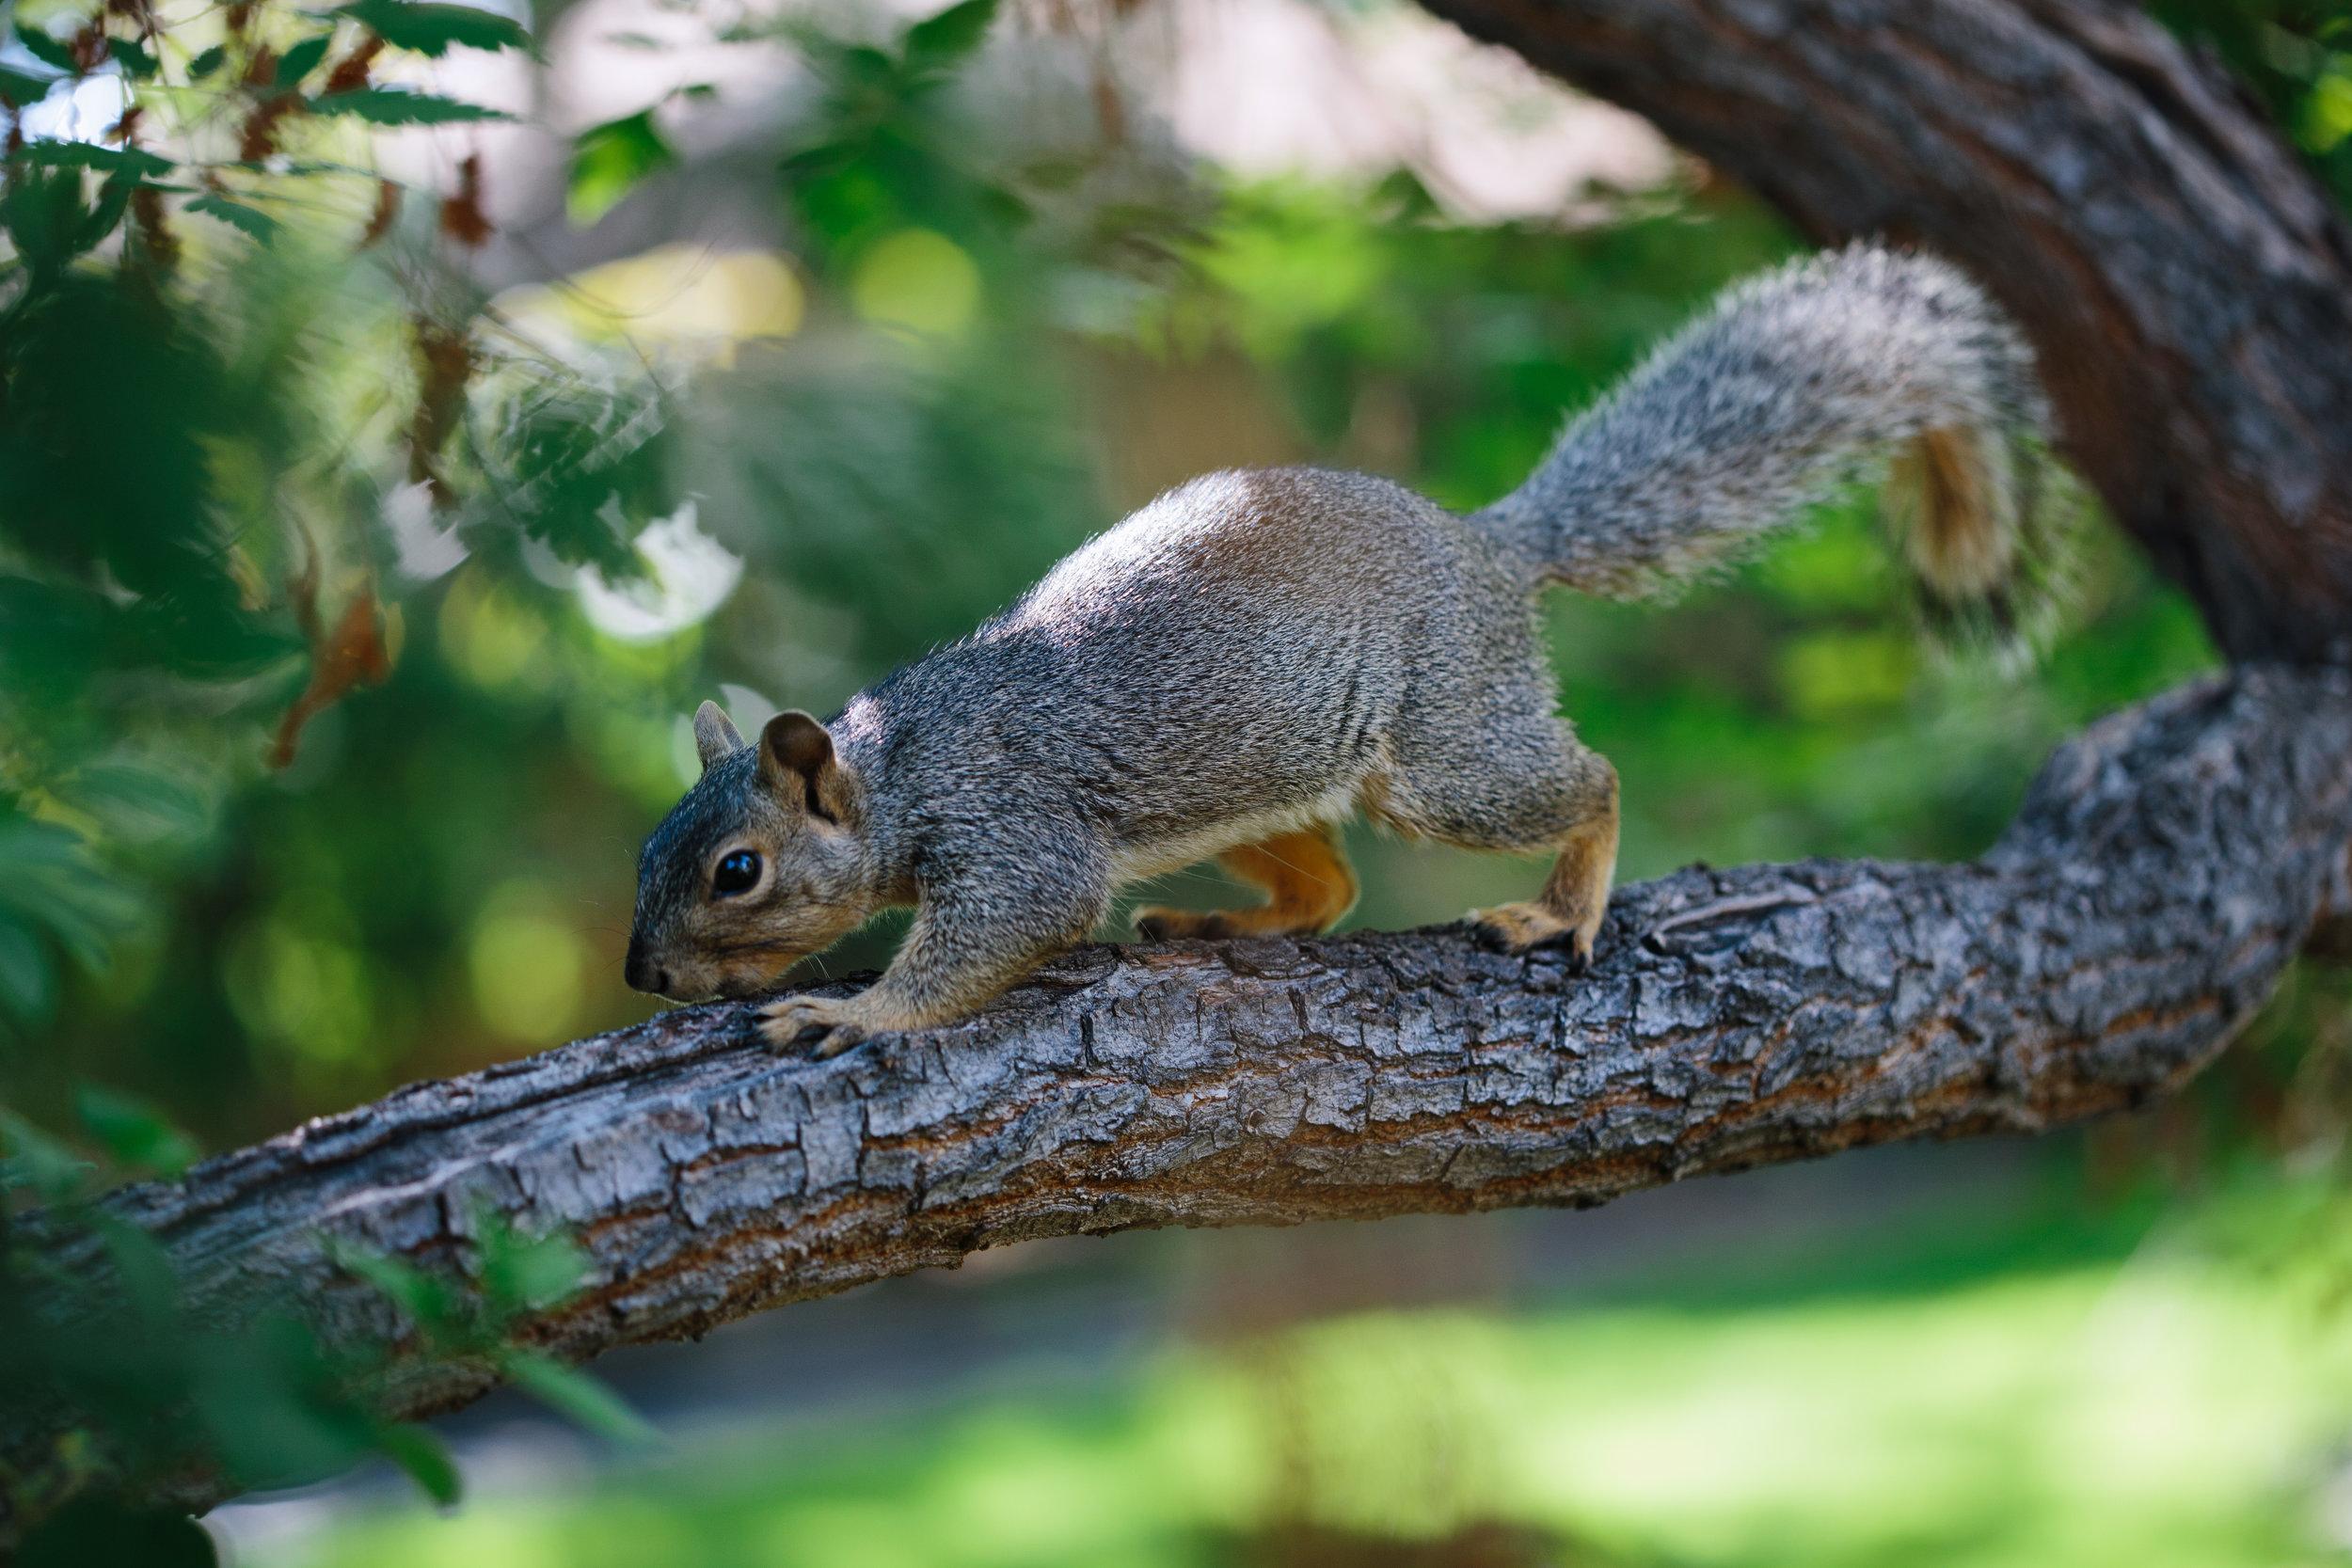 Squirrel backyard 2.jpg